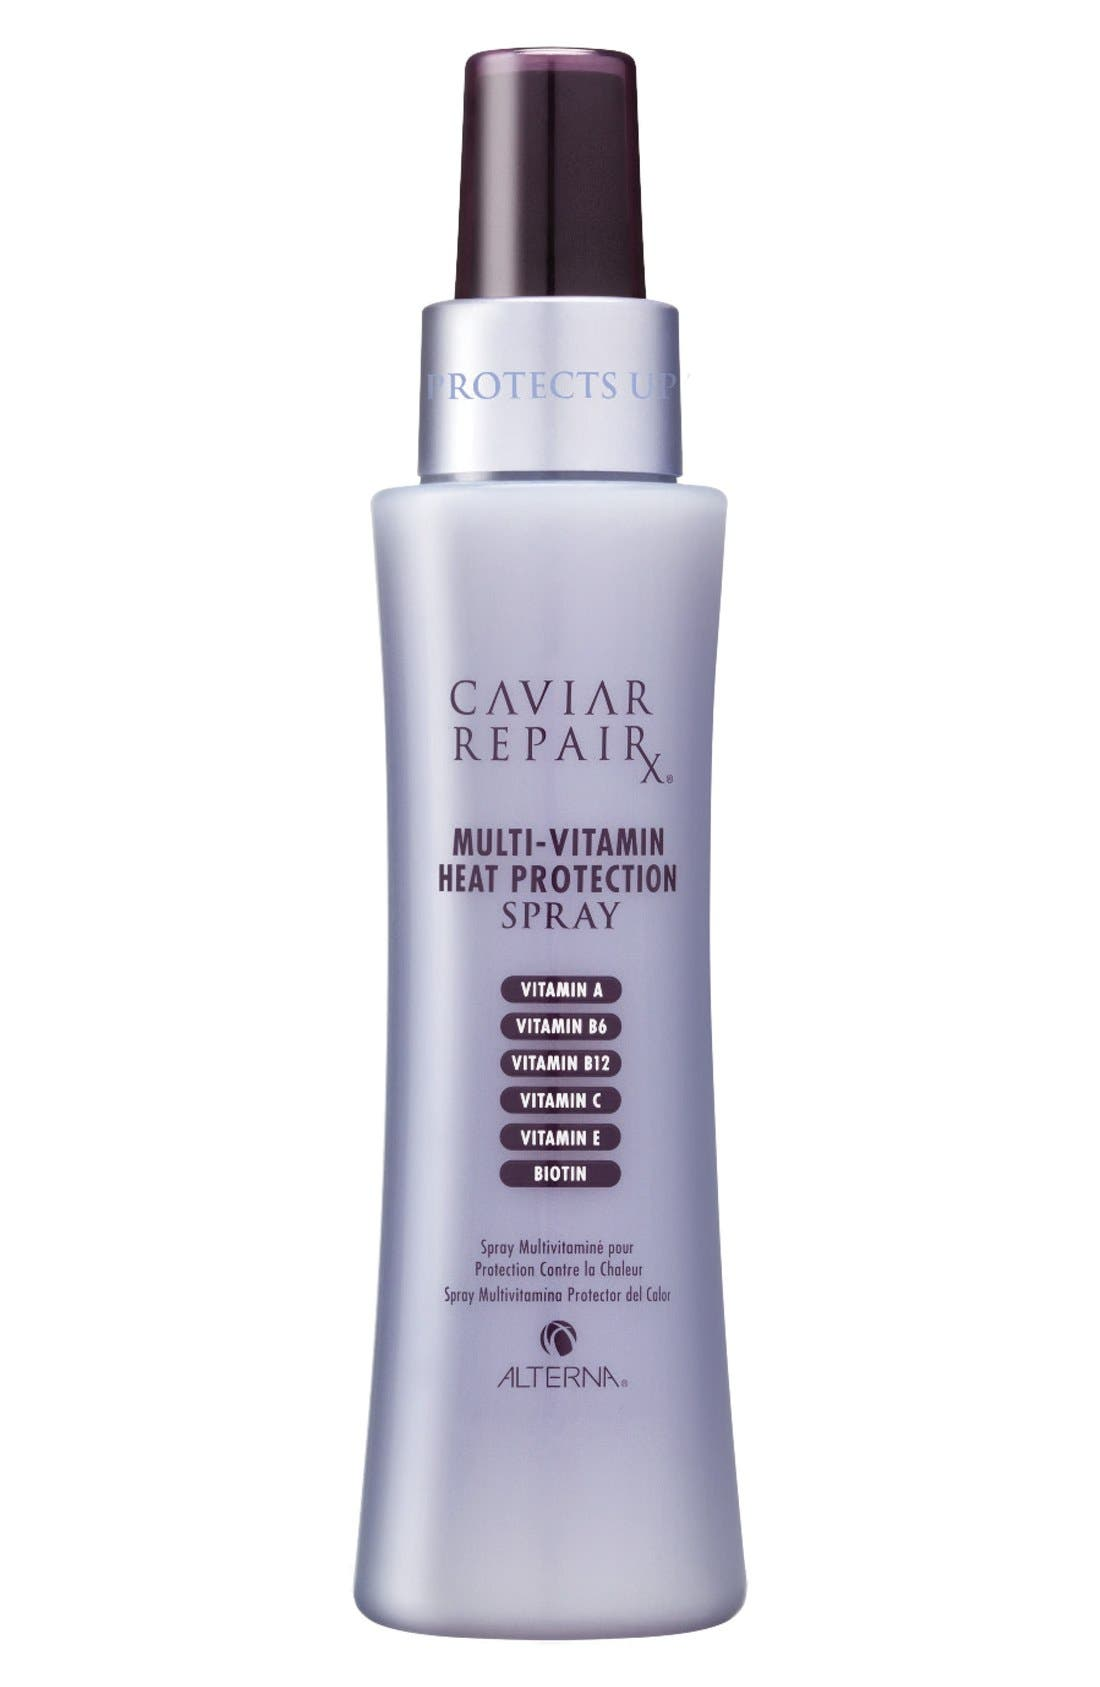 Caviar Repair Rx Multi-Vitamin Heat Protection Spray,                             Main thumbnail 1, color,